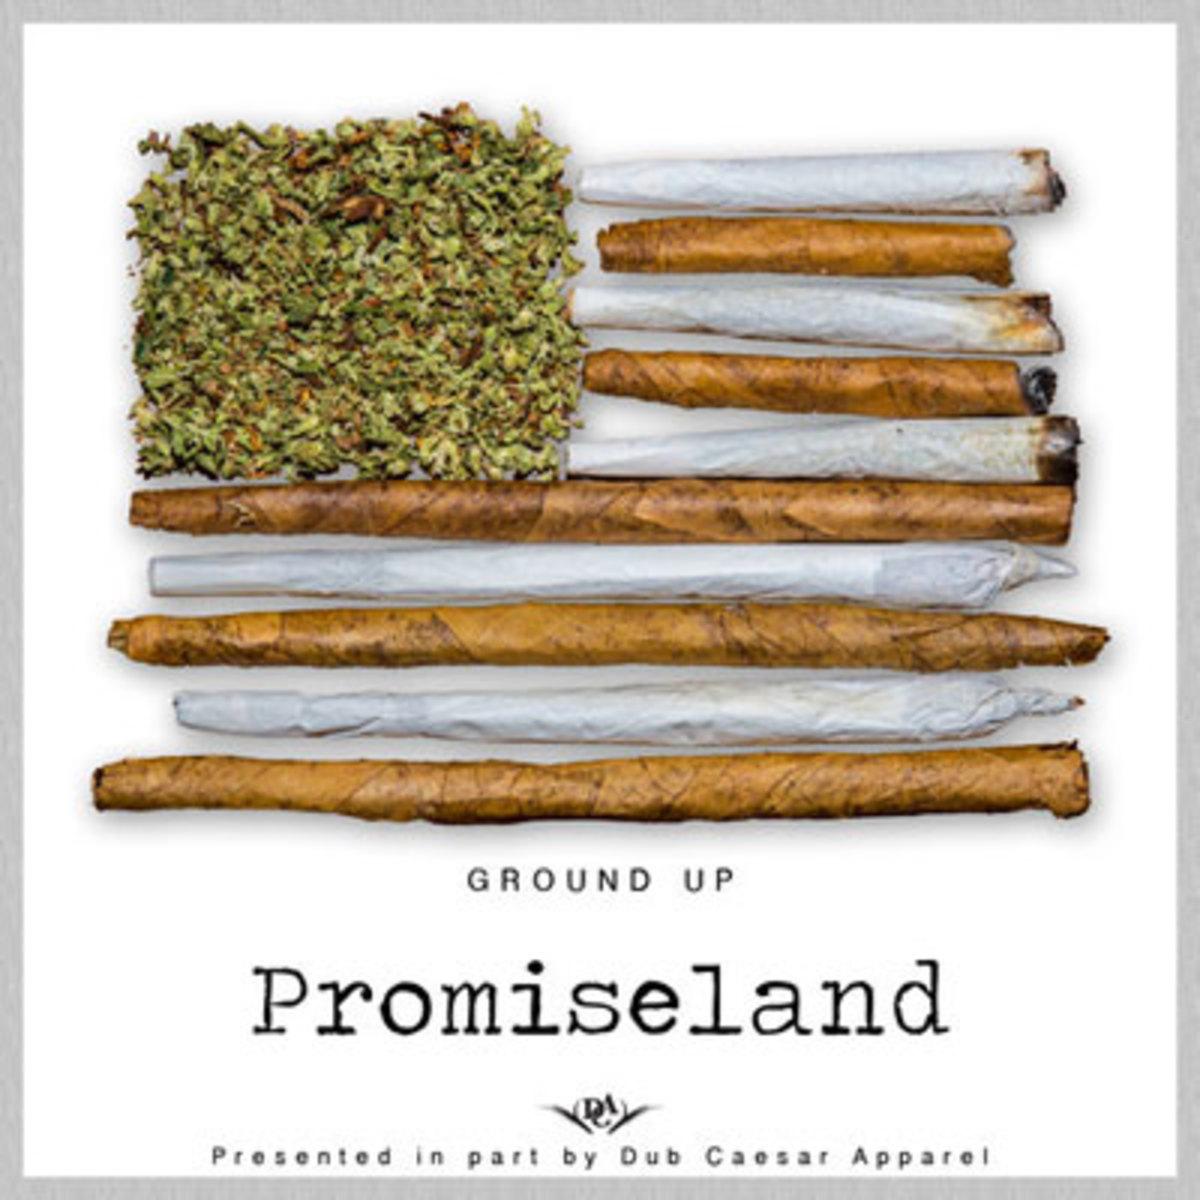 groundup-promiseland.jpg